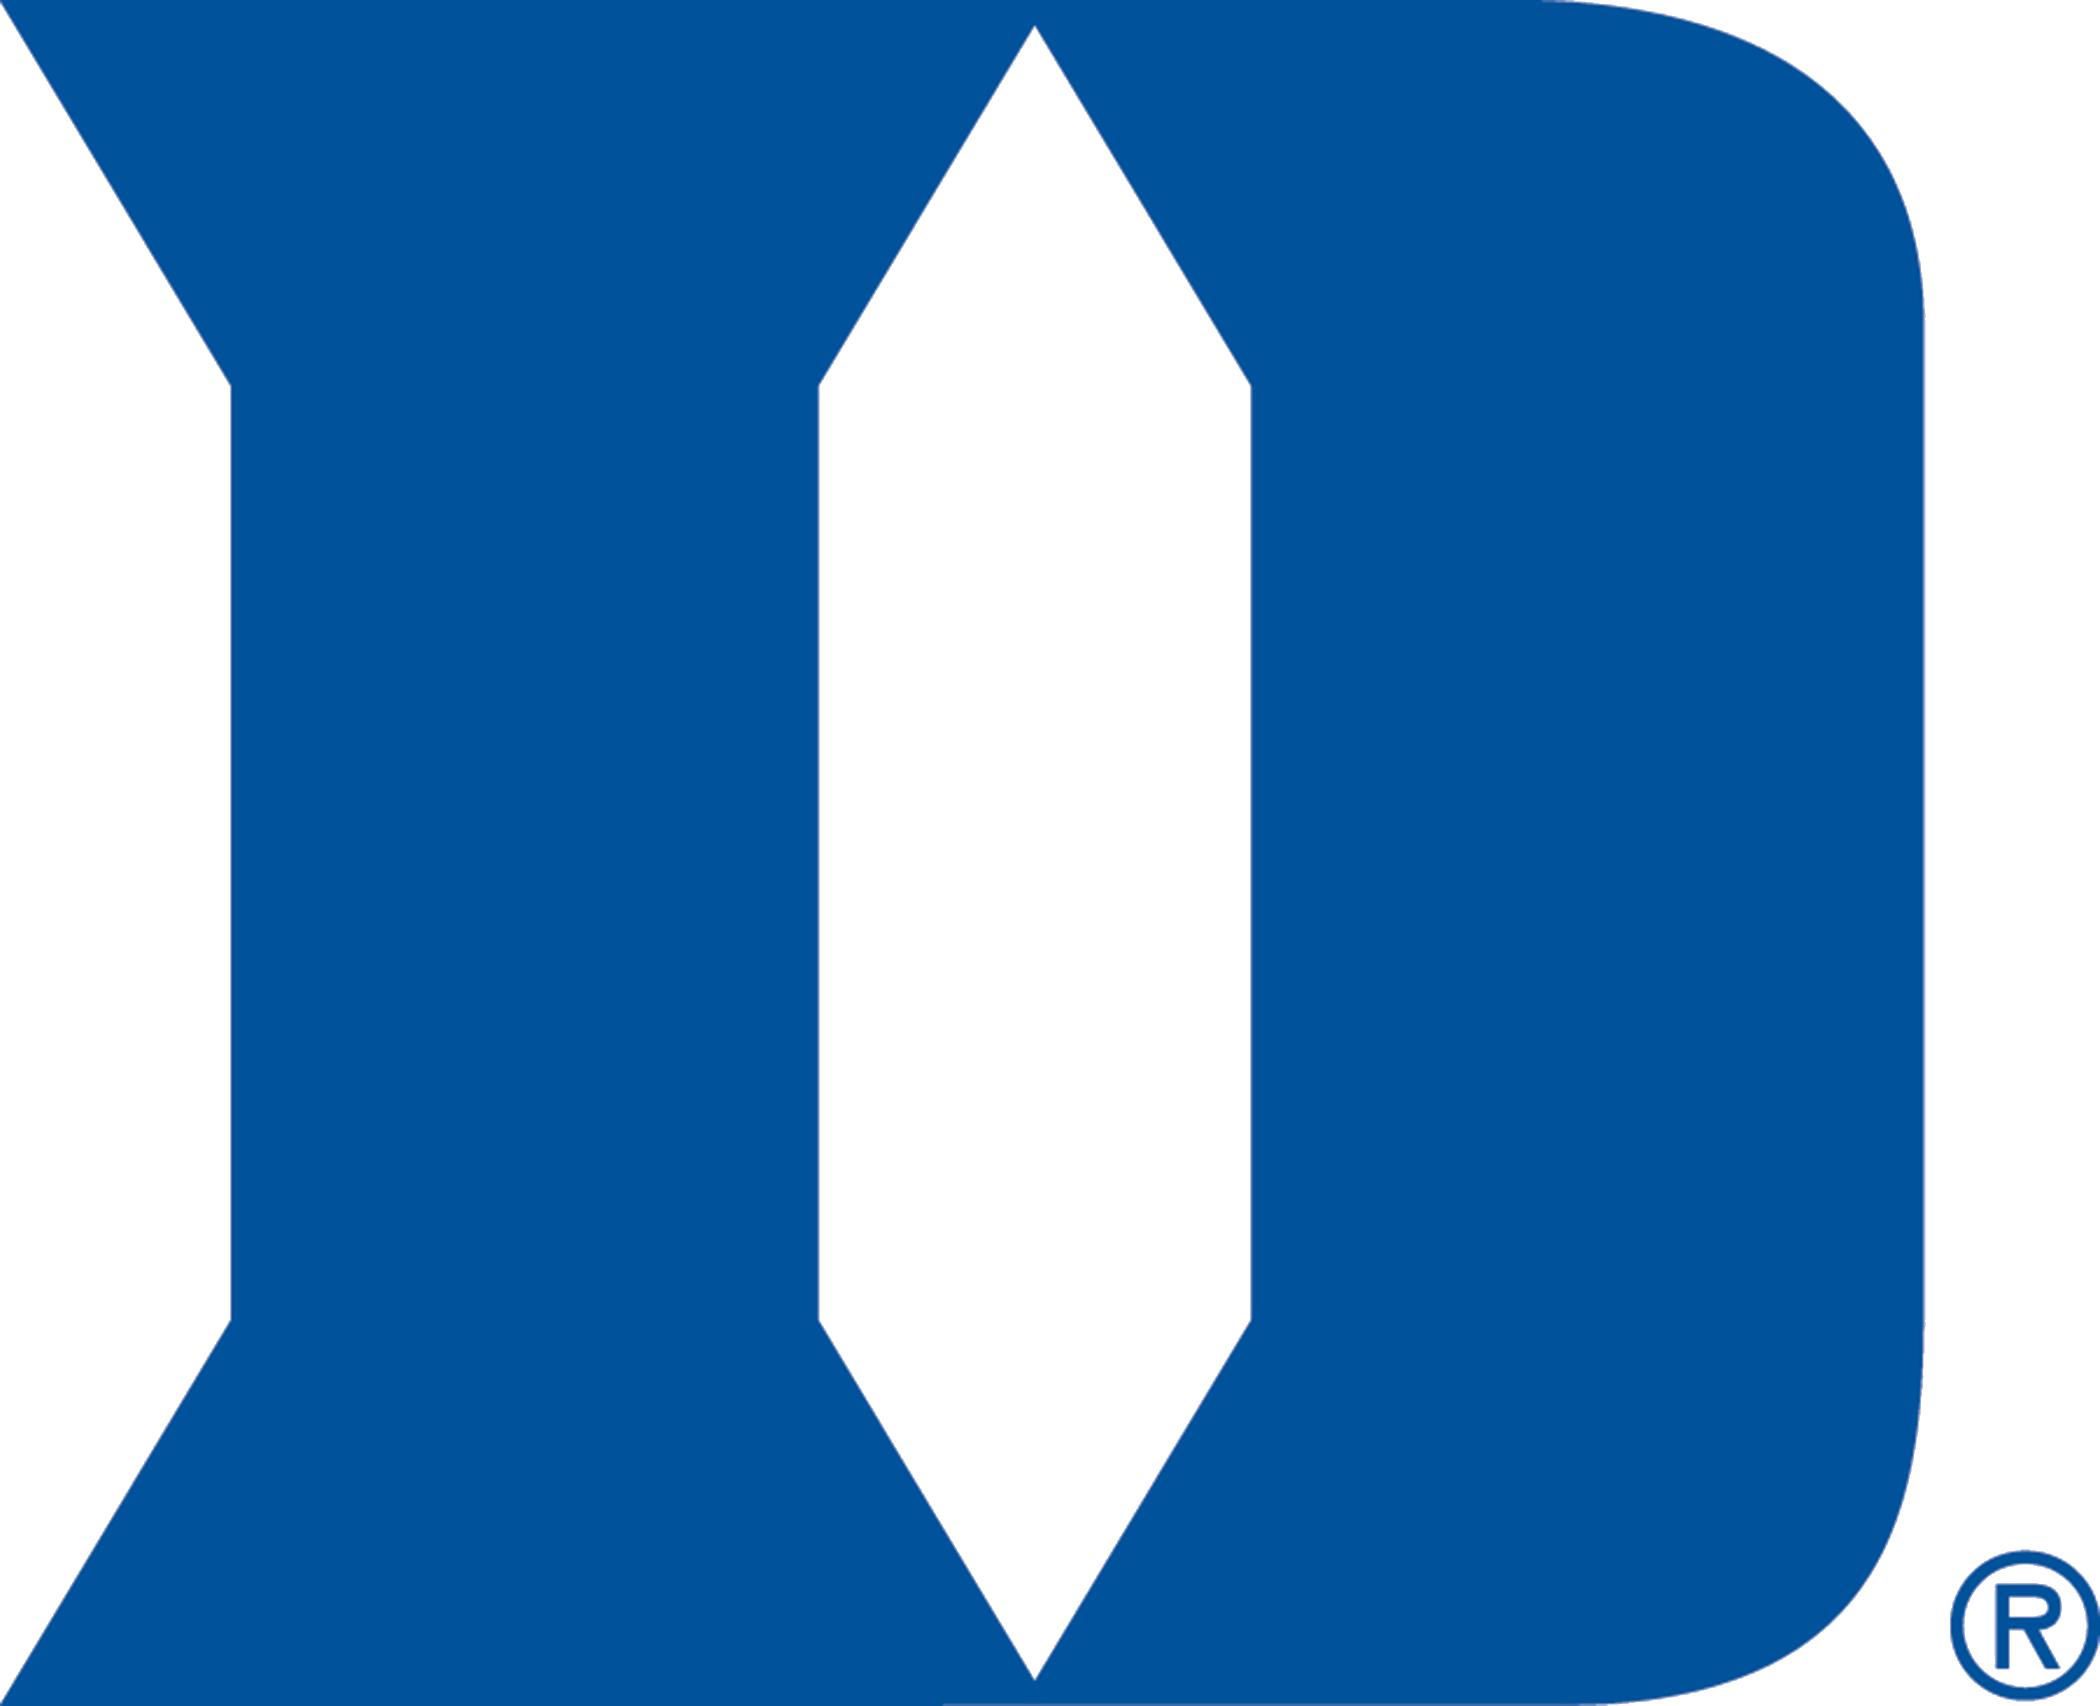 Duke logo clipart picture HD Clipart Duke University Collection - Duke University Logo , Free ... picture